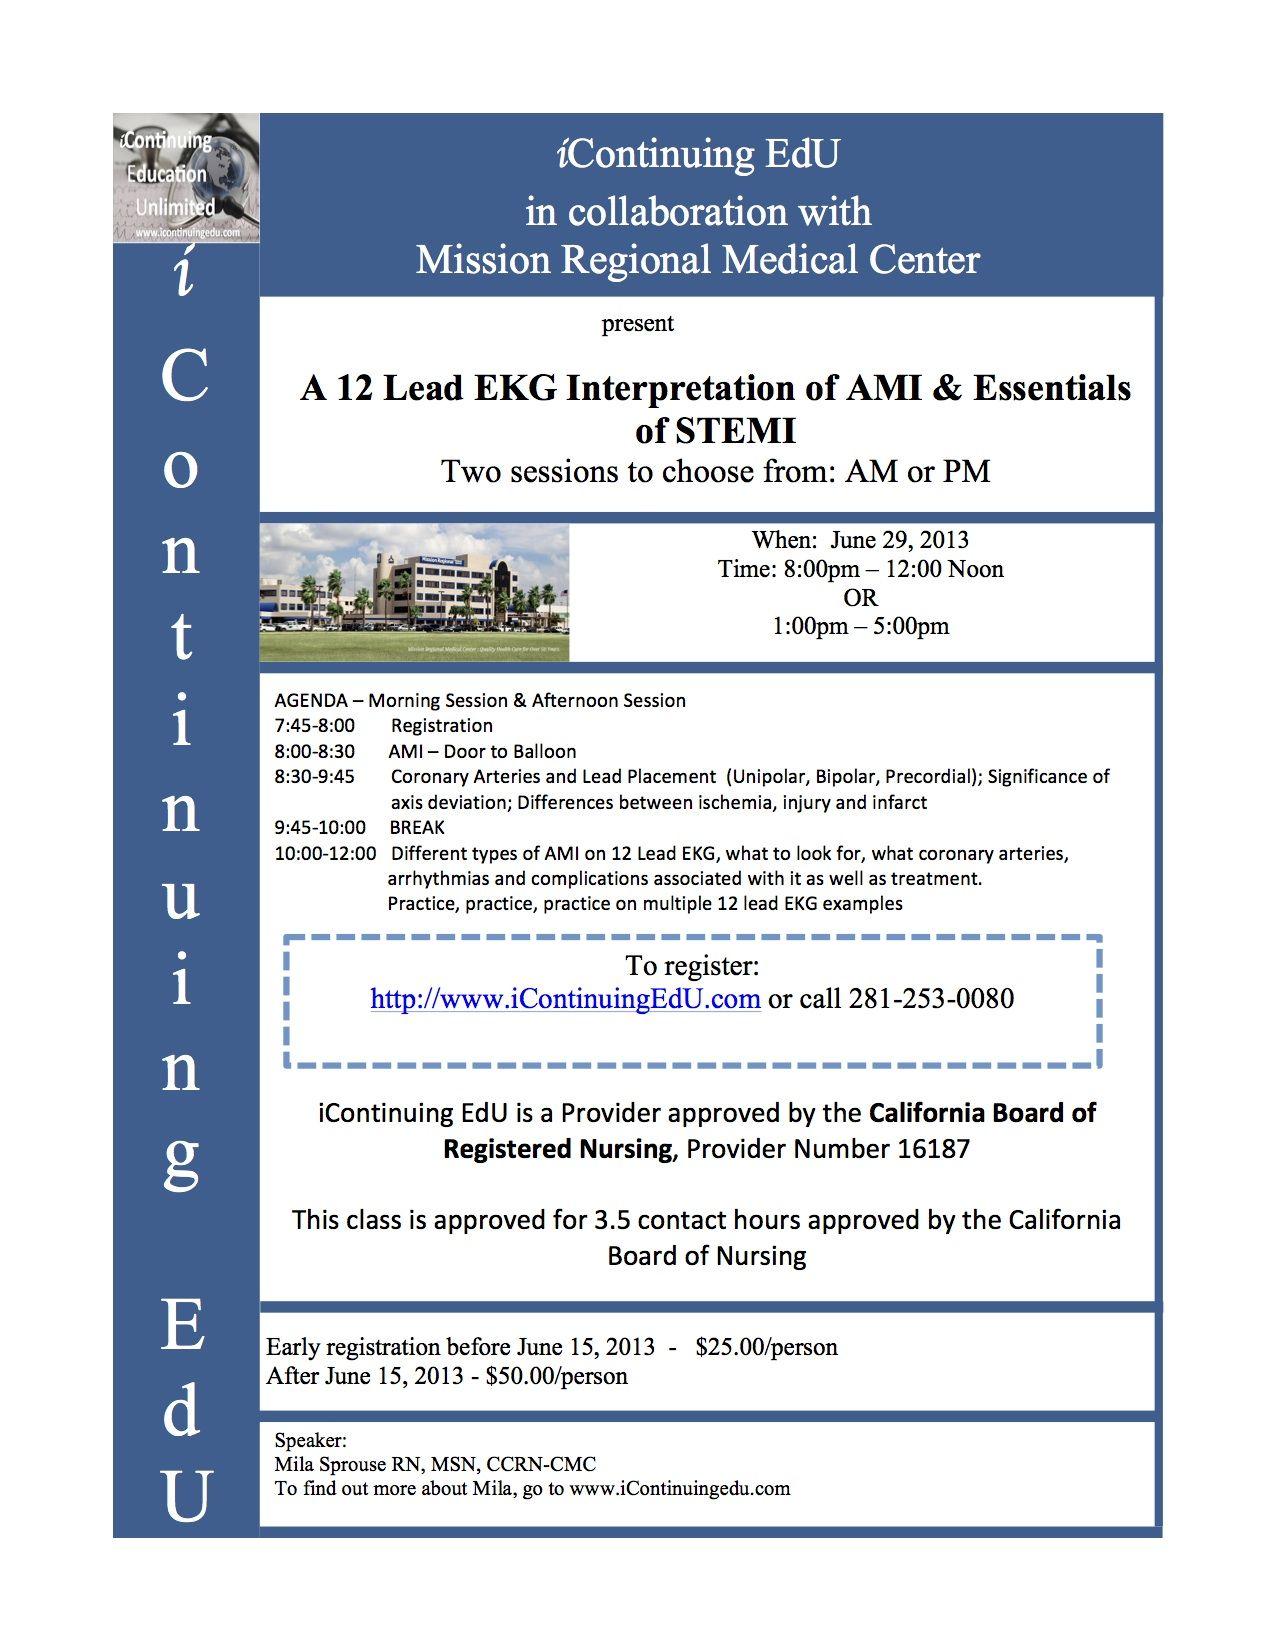 A 12 Lead Ekg At Mission Regional Medical Center Mission